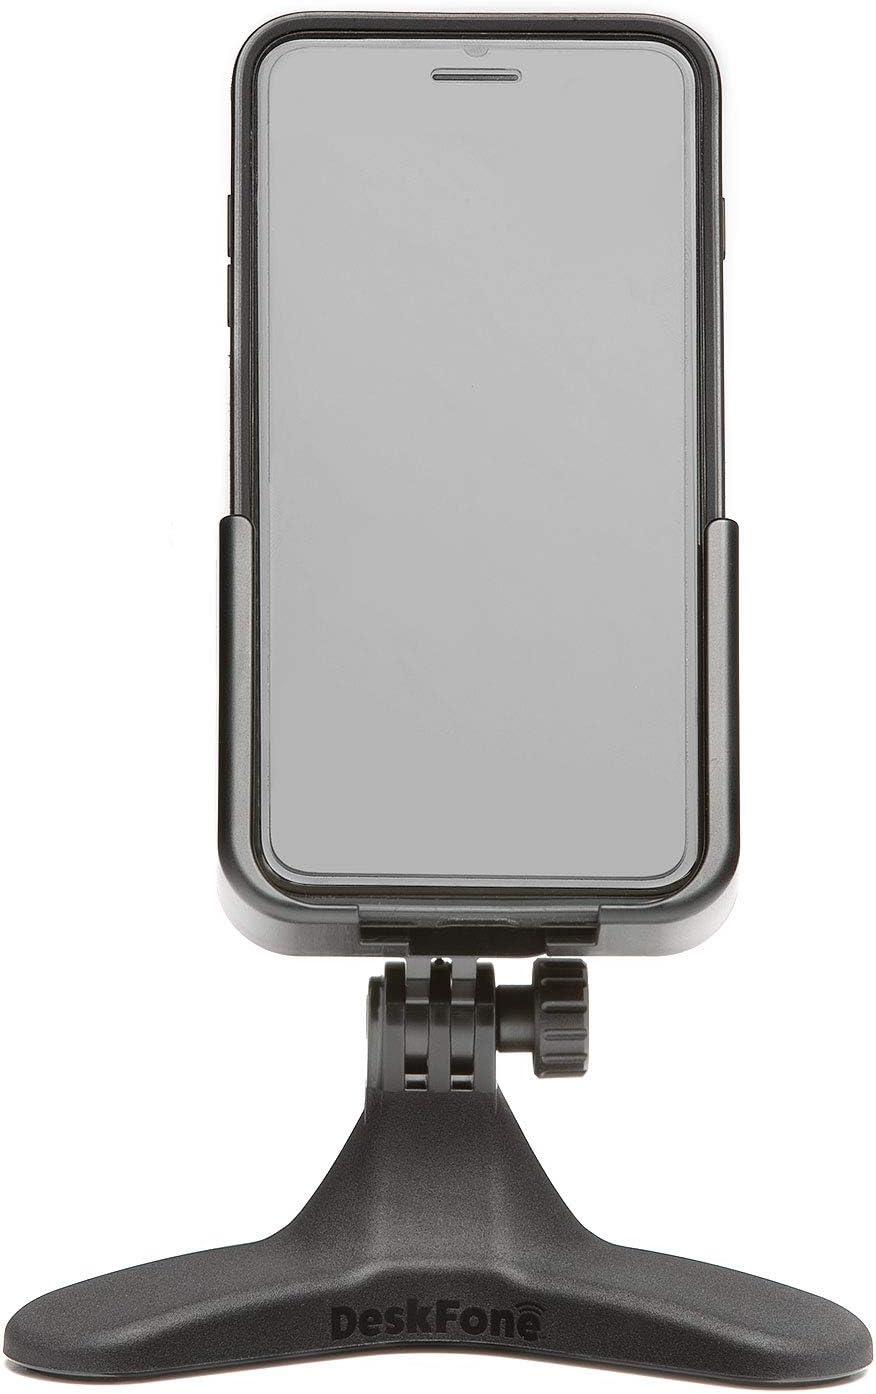 WeatherTech DeskFone - Universal Desktop Cell Phone Holder